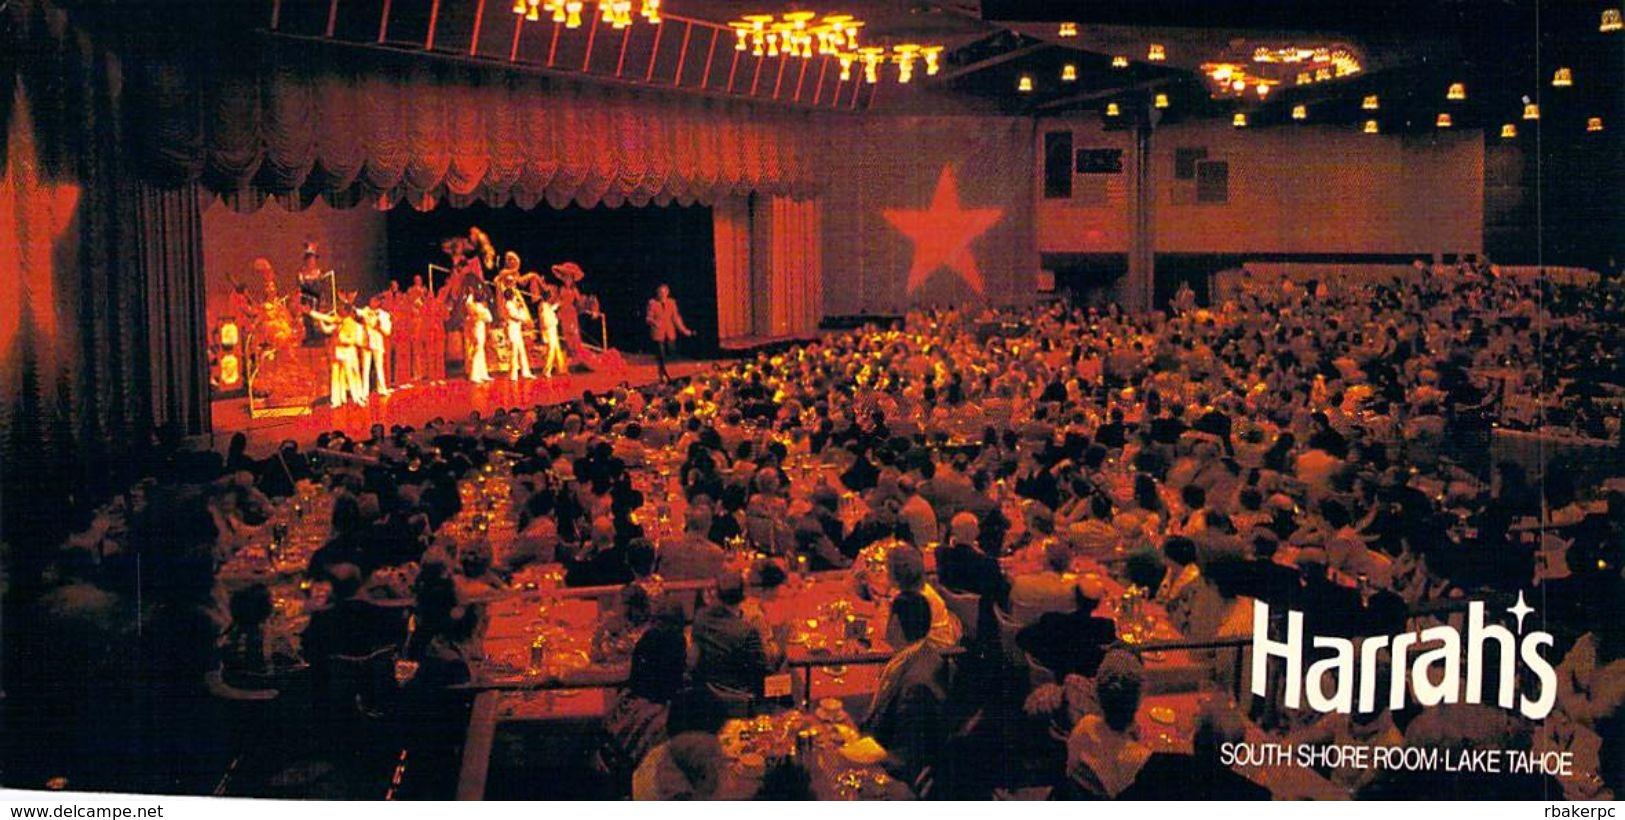 Harrah's Casino Lake Tahoe - South Shore Room Theatre-Restaurant - United States